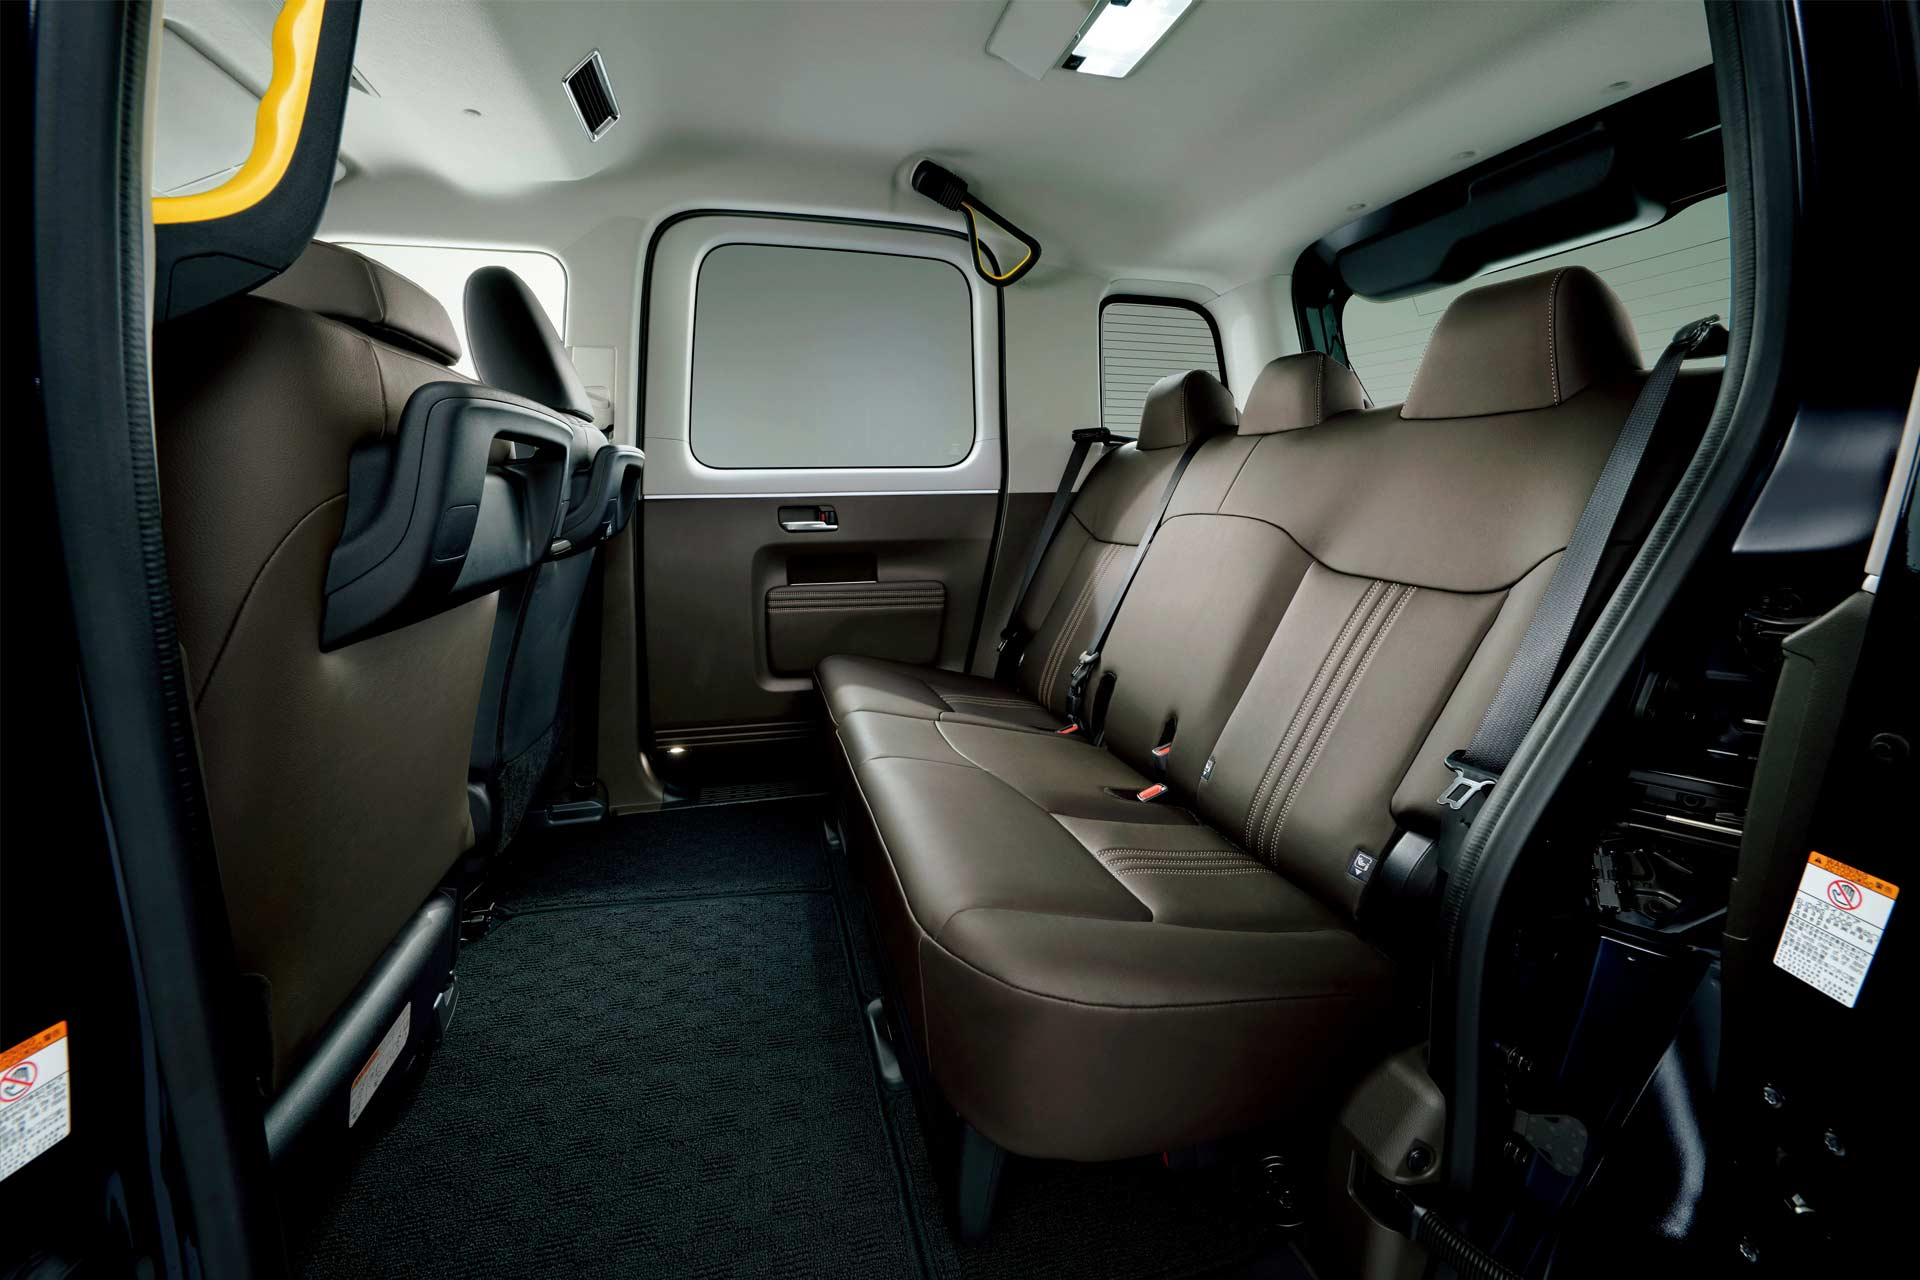 Toyota-JPN-Taxi-interior_2